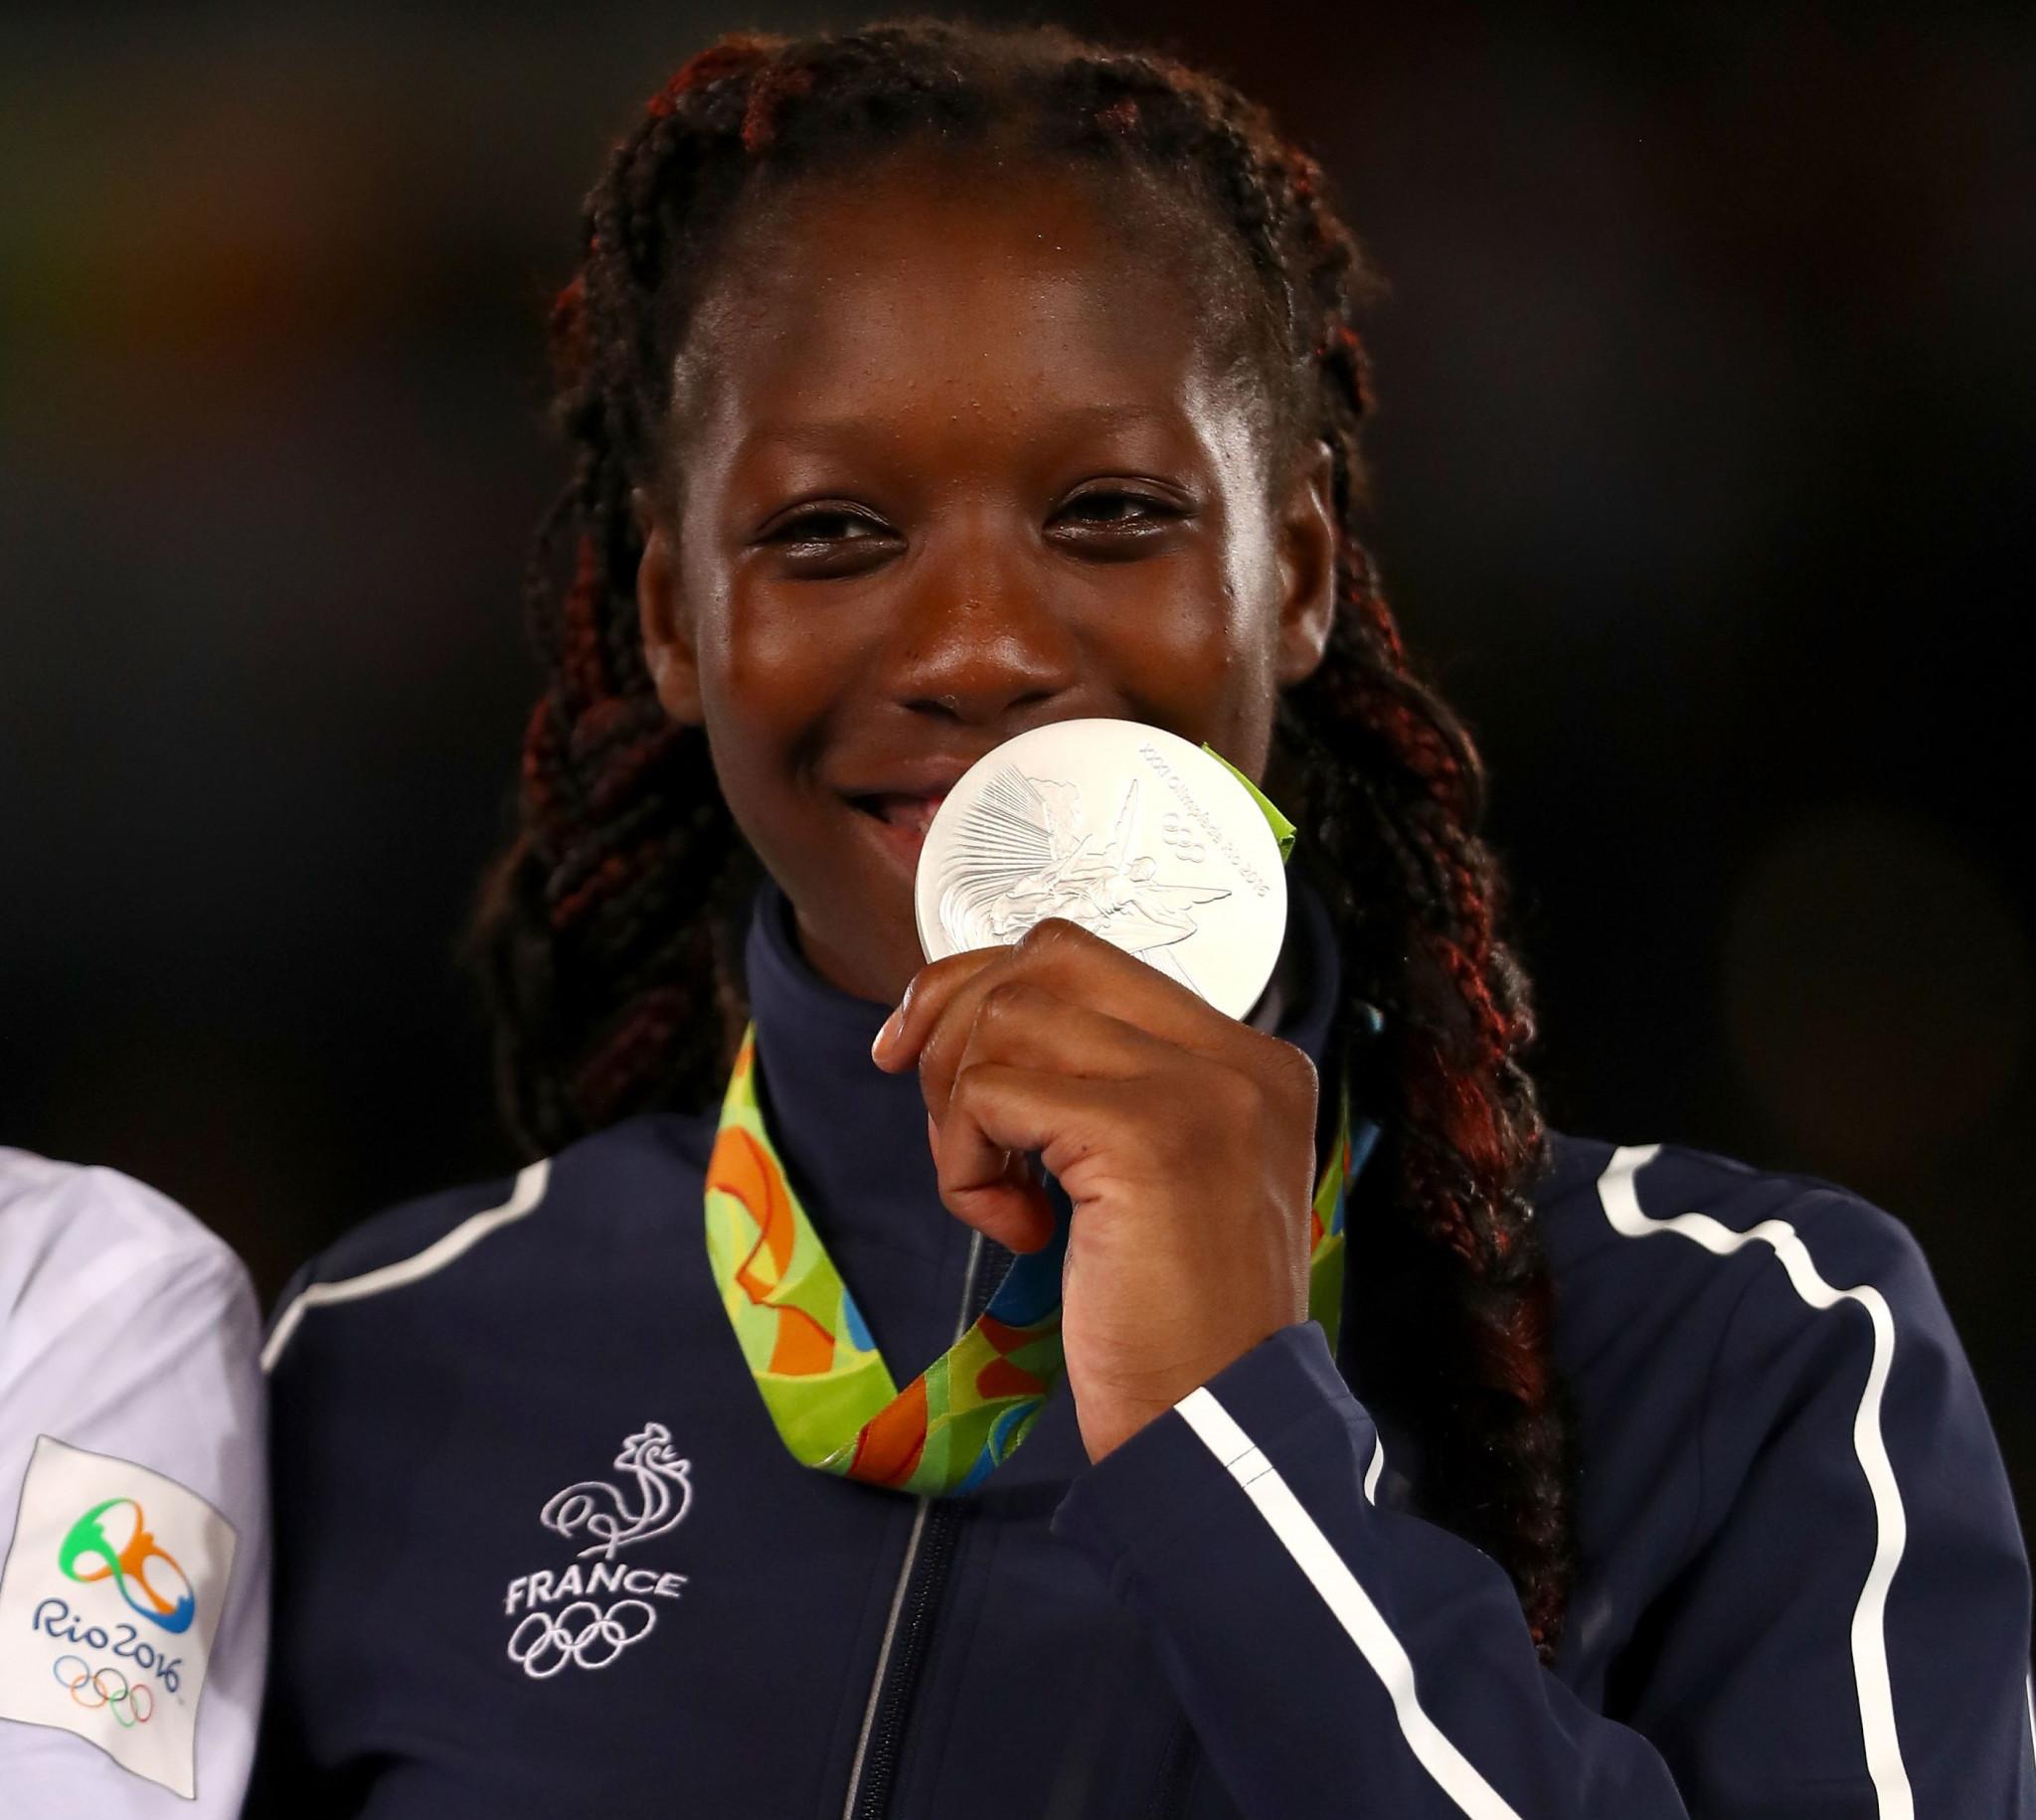 Olympic taekwondo medallist and ex-world champion Niaré retires